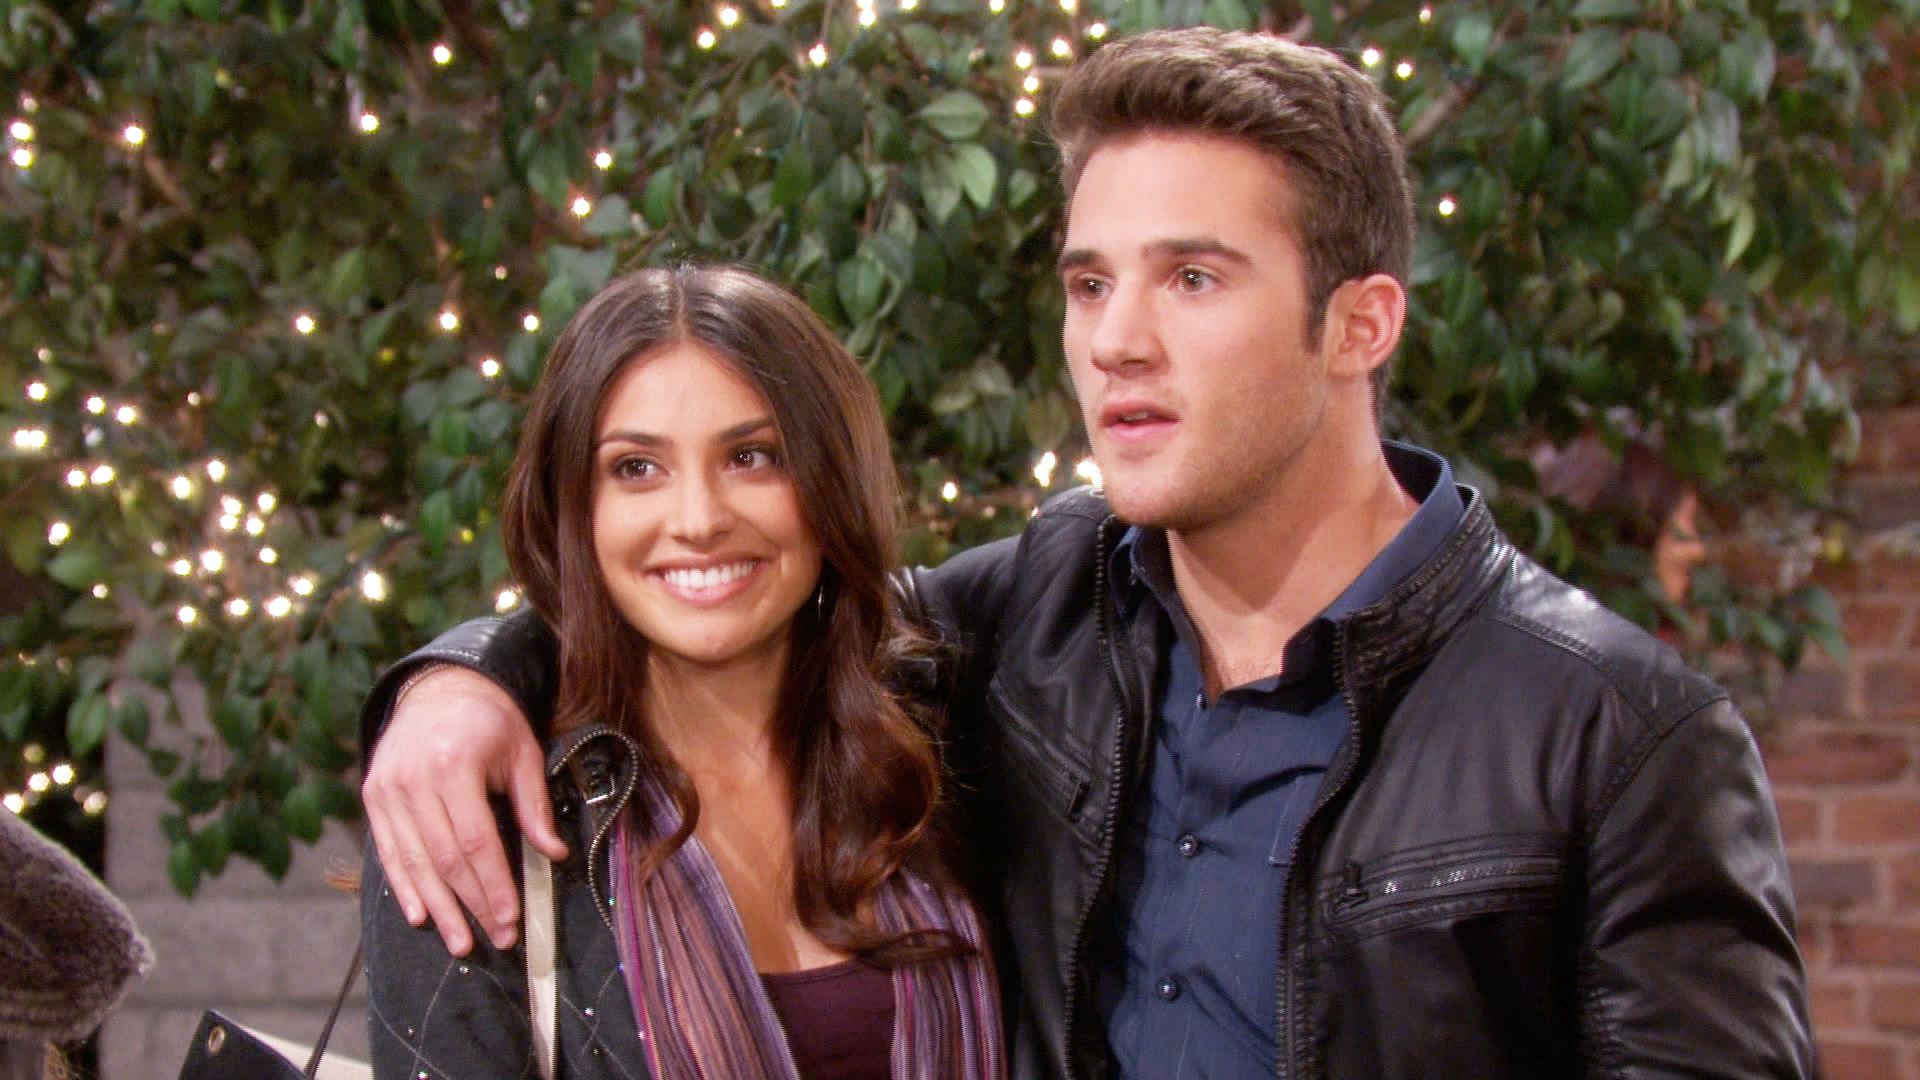 little couple episode guide 2015